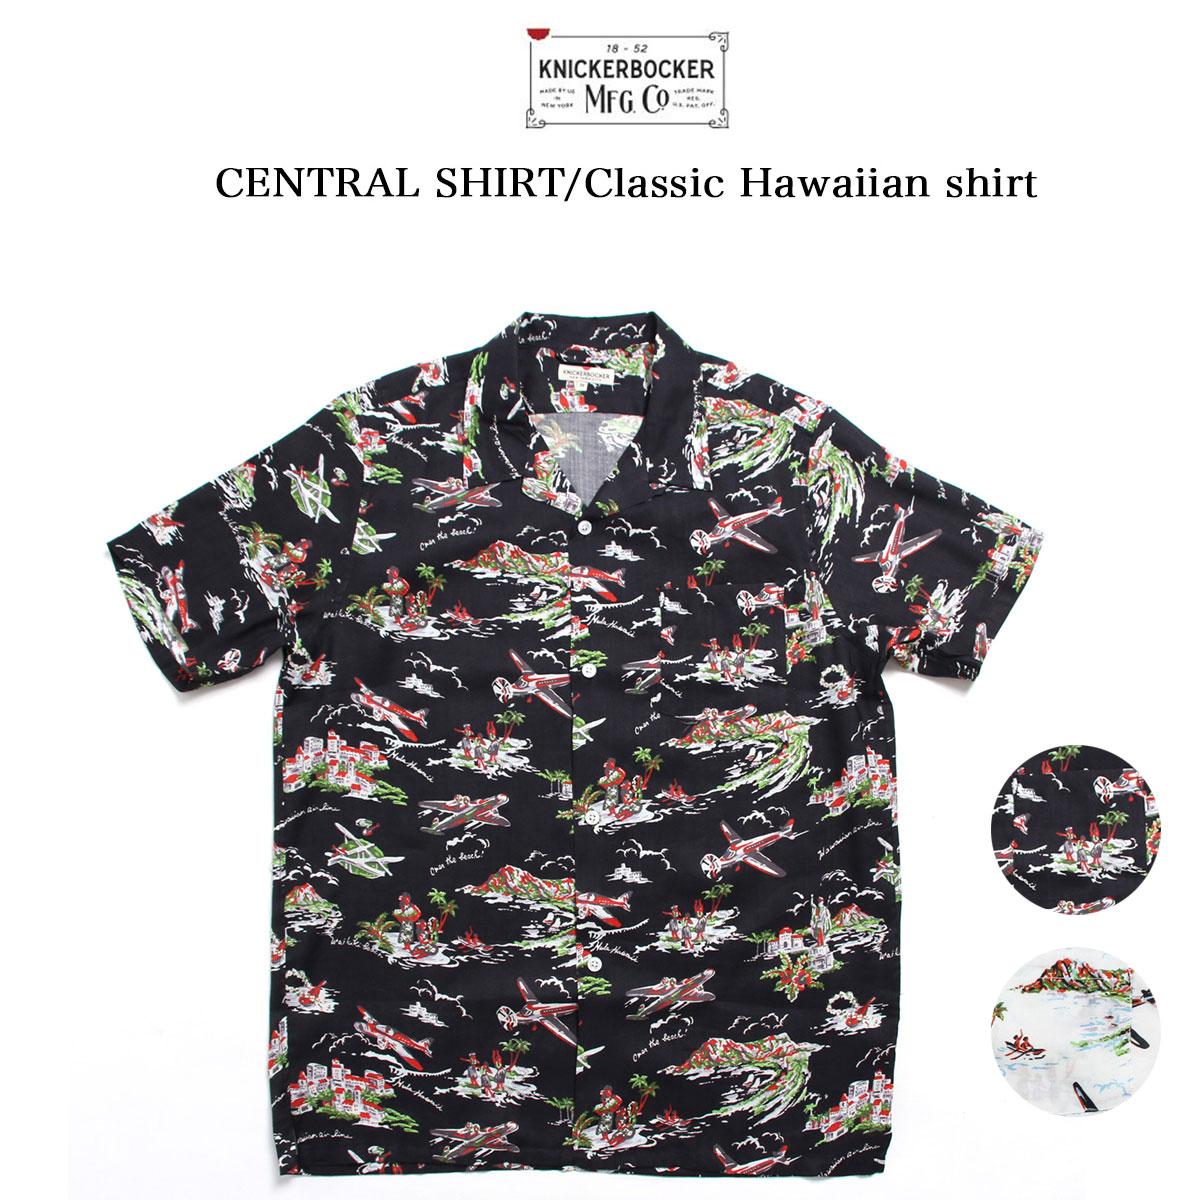 KNICKERBOCKER MFG.CO.(ニッカーボッカー)セントラルシャツ Classic Hawaiian shirt